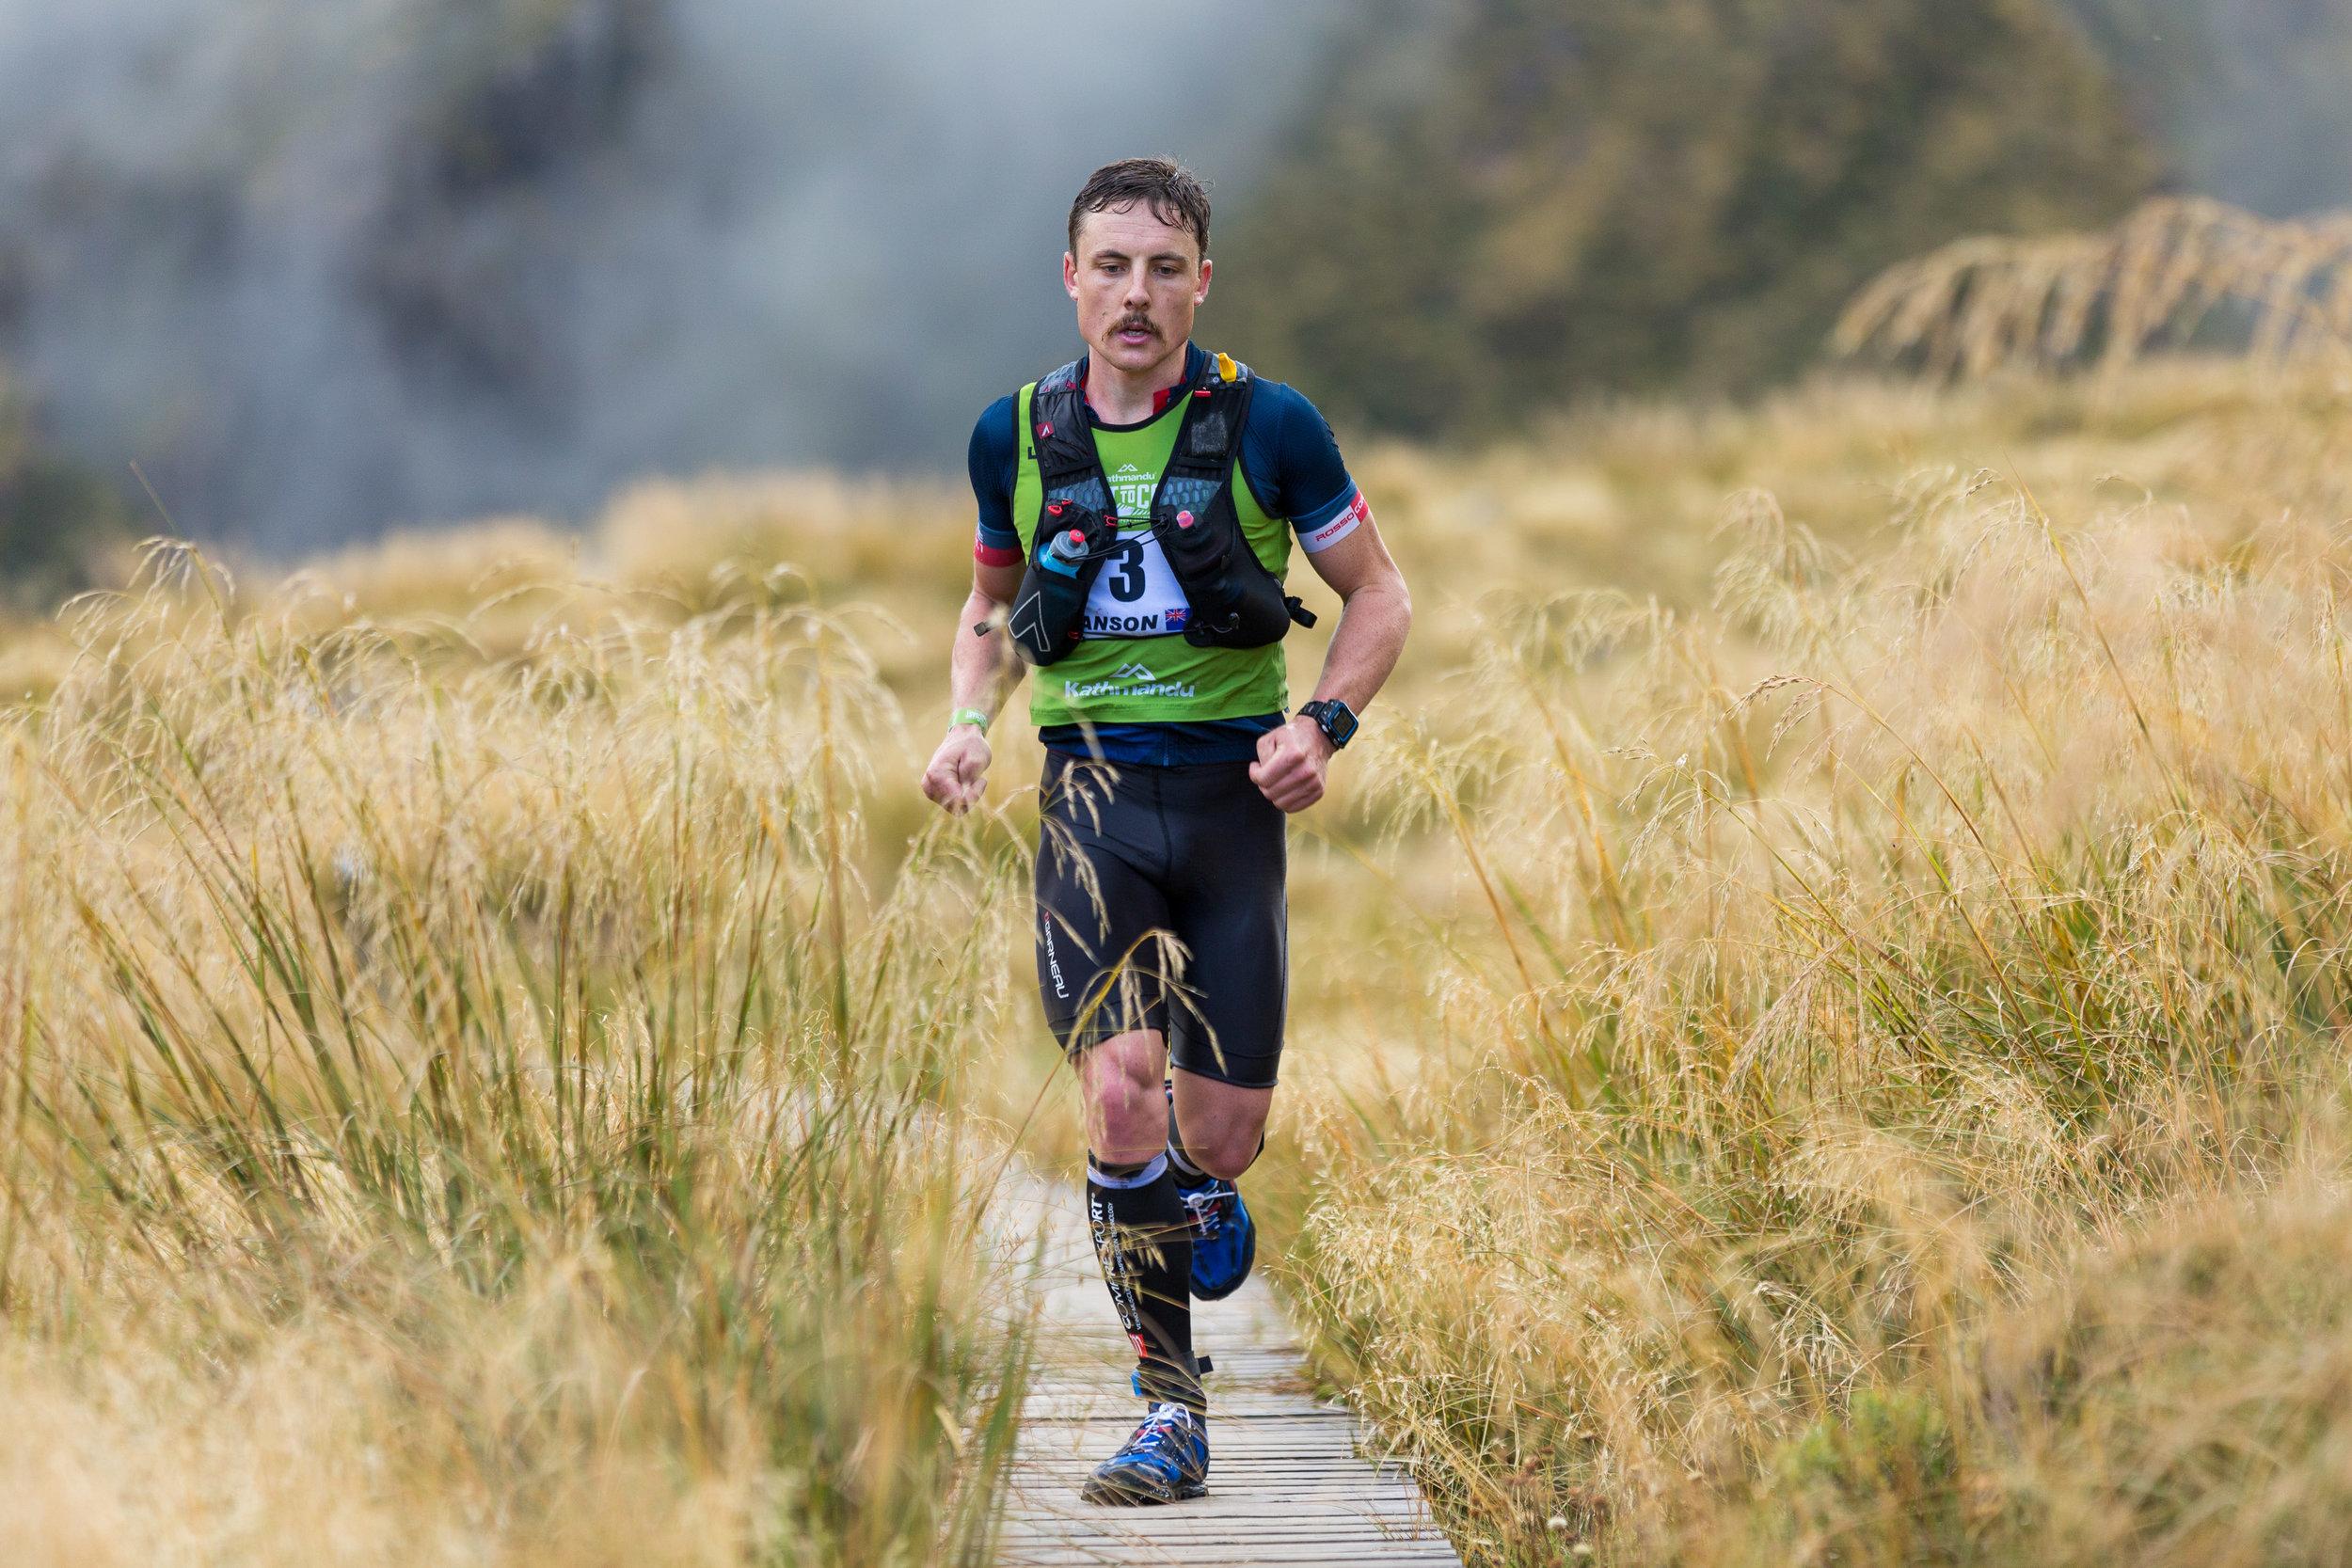 Sam Manson on the Coast to Coast run course. Photo: Marathon Photos